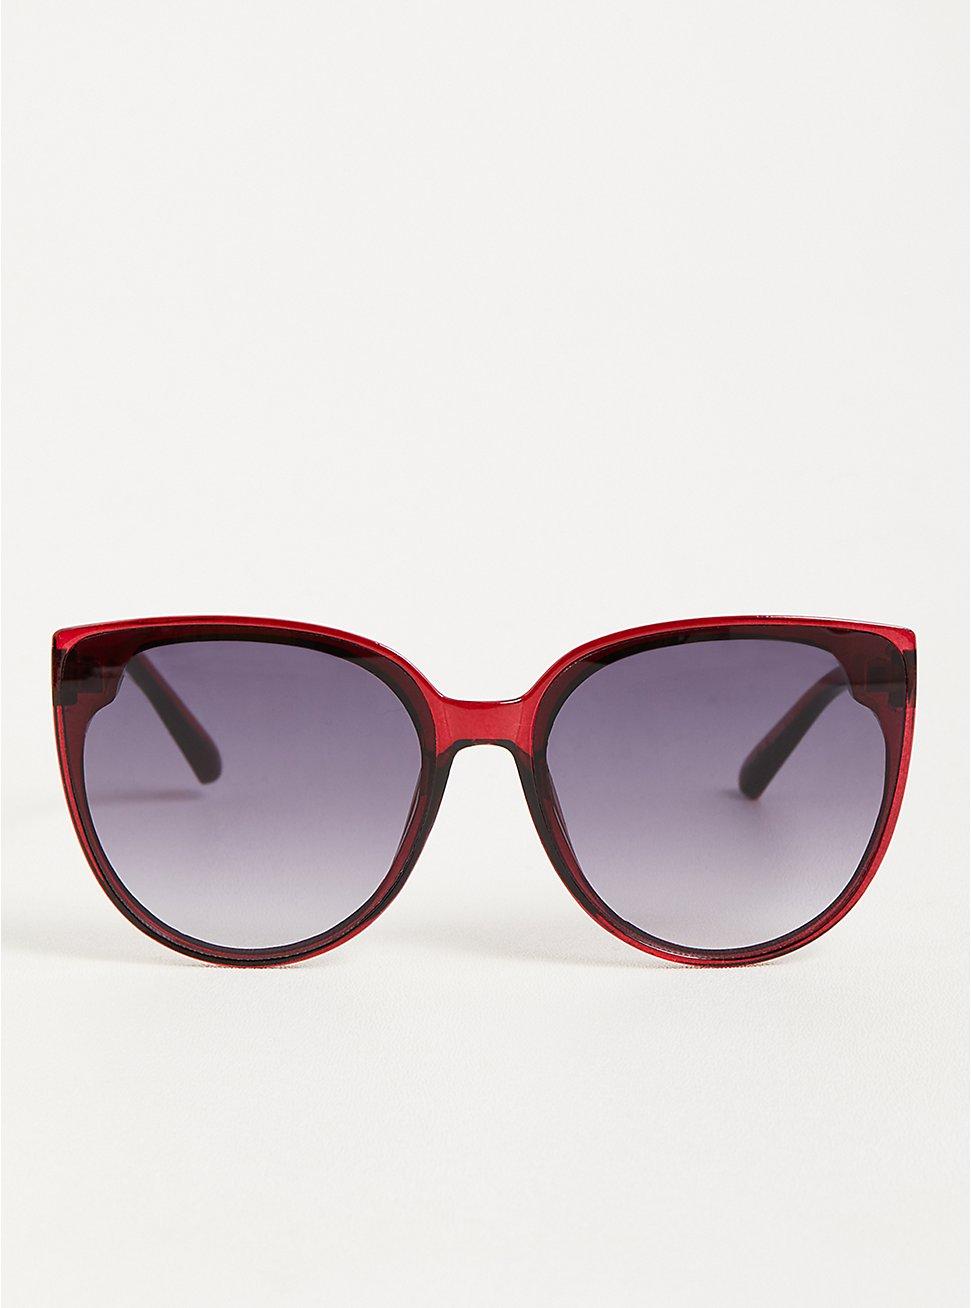 Cat Eye Sunglasses - Burgundy with Smoke Lens, , hi-res